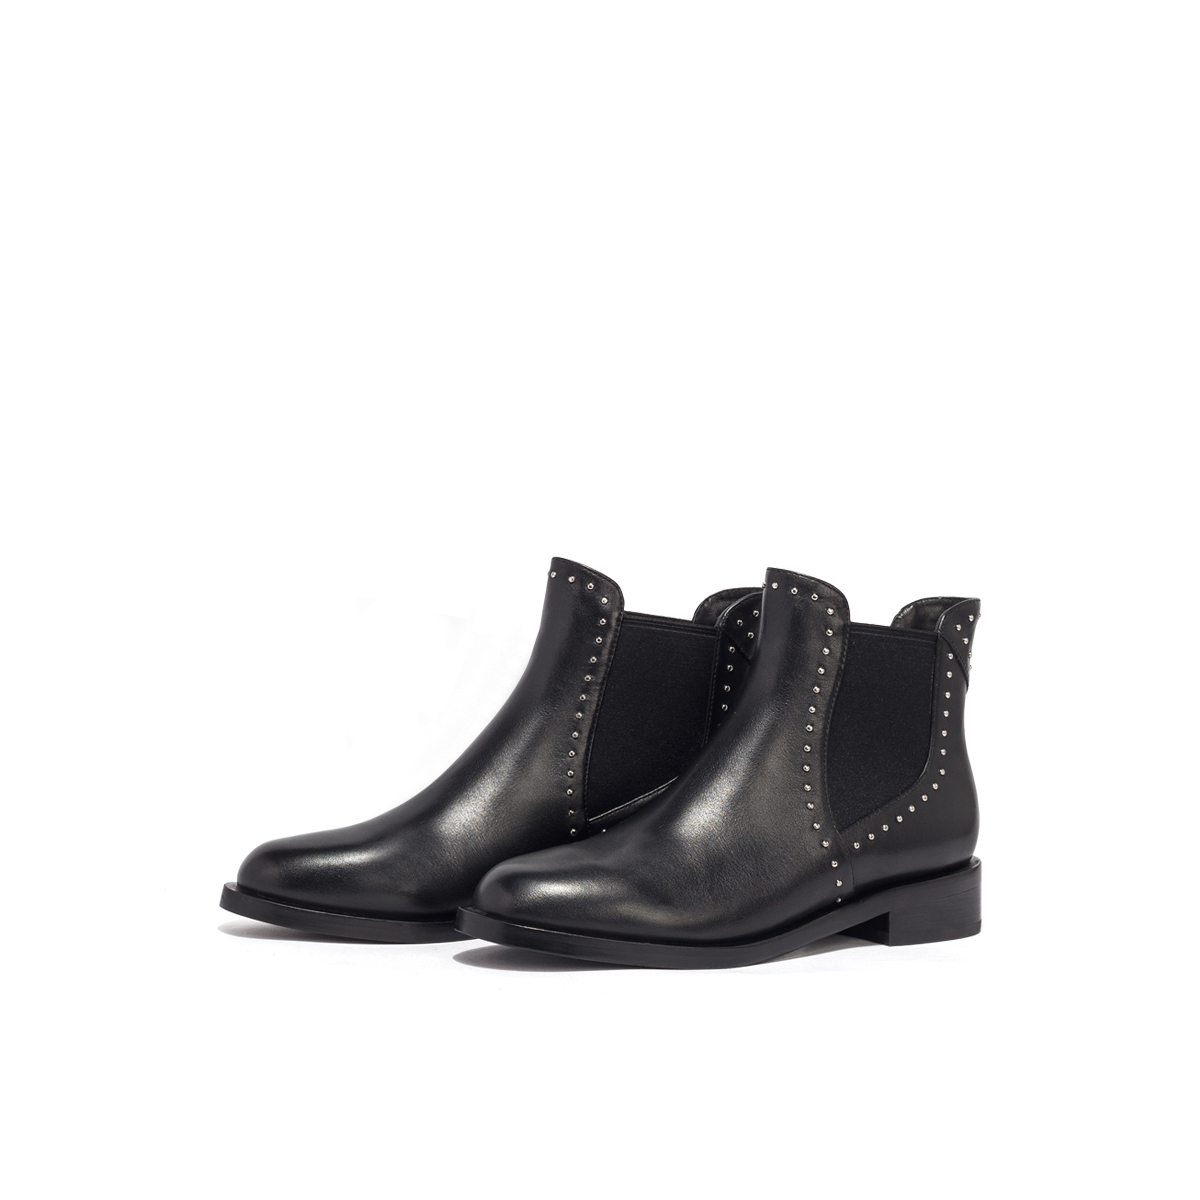 SS03116330 新款秋冬英伦风圆头切尔西靴时尚短靴女靴 2020 星期六